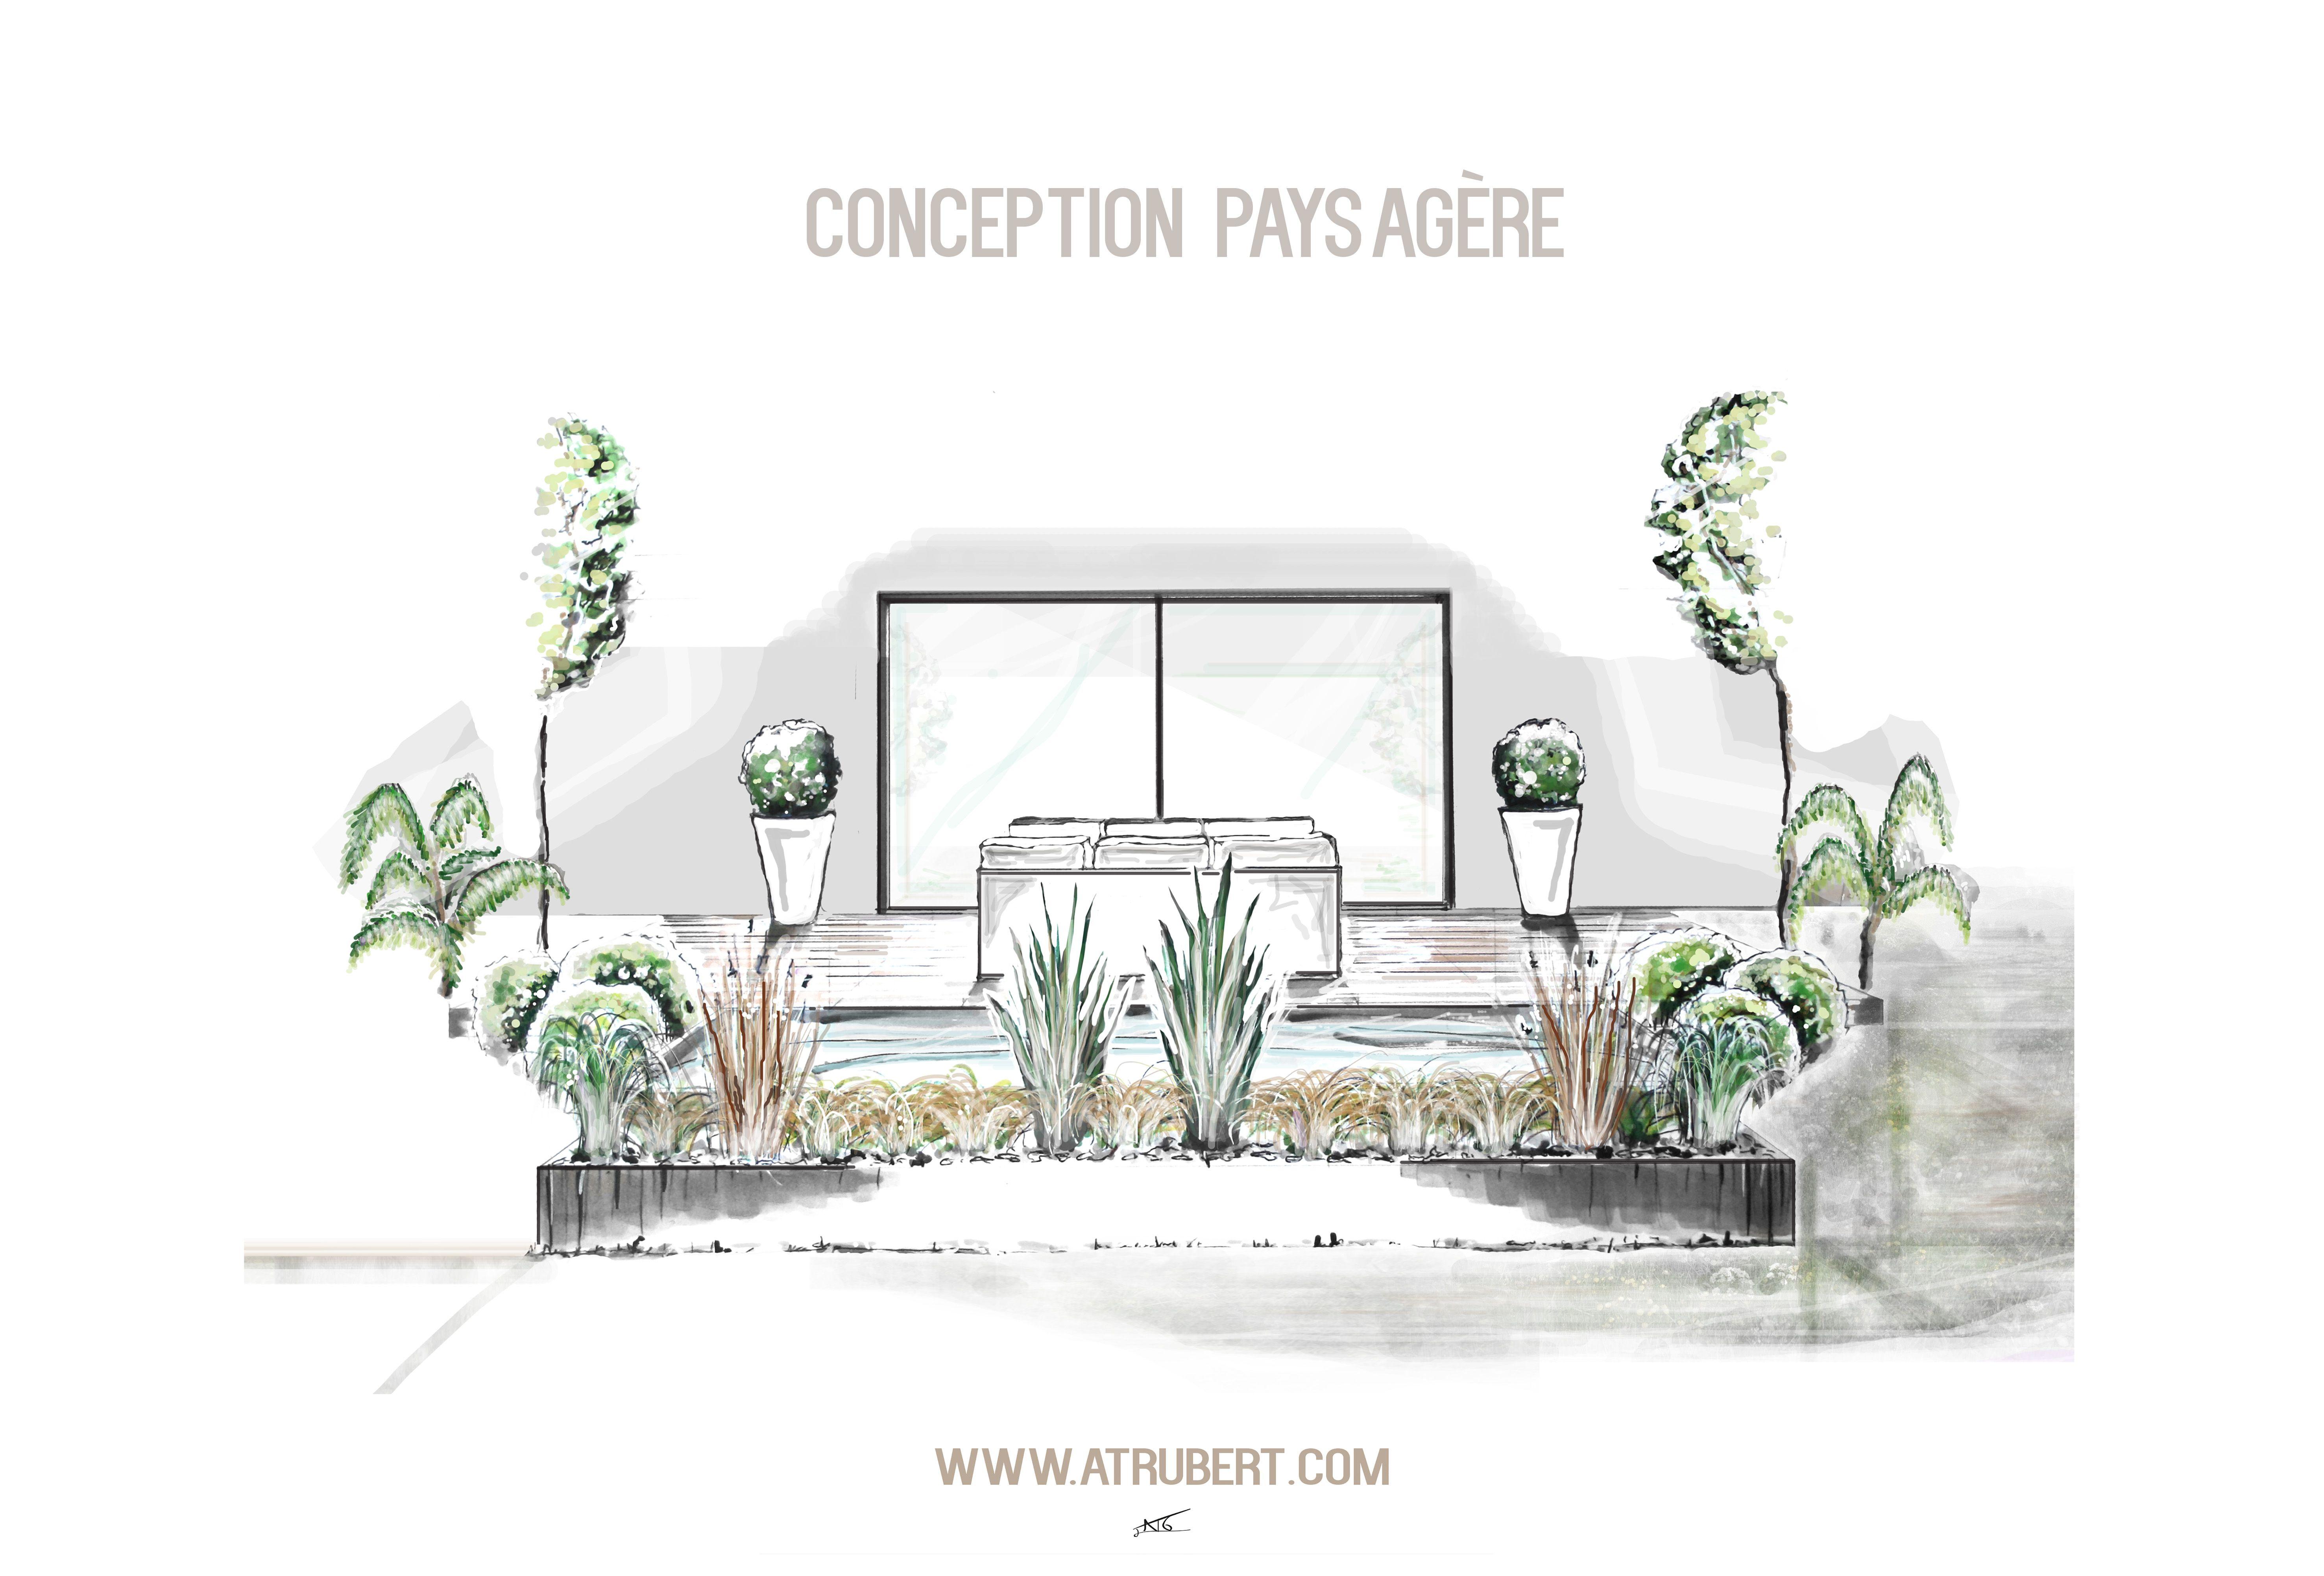 dessin perspective alexandre trubert a t elier 16 design architecte d 39 int rieur designer nantes. Black Bedroom Furniture Sets. Home Design Ideas